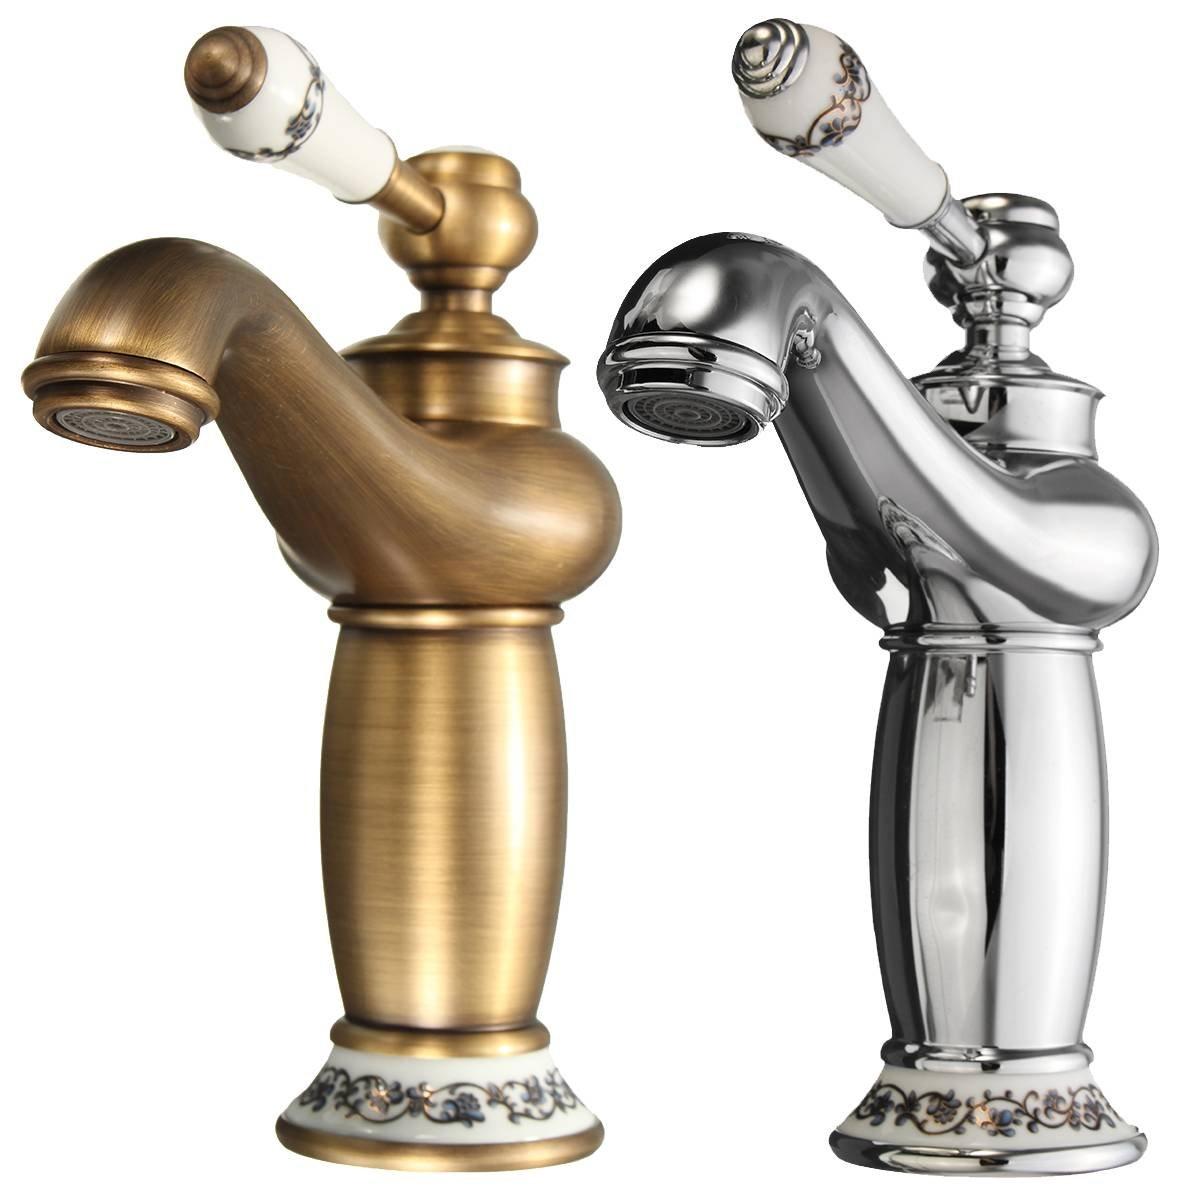 KING DO WAY Wasserhahn antiken bronze Messing becken spuele ...